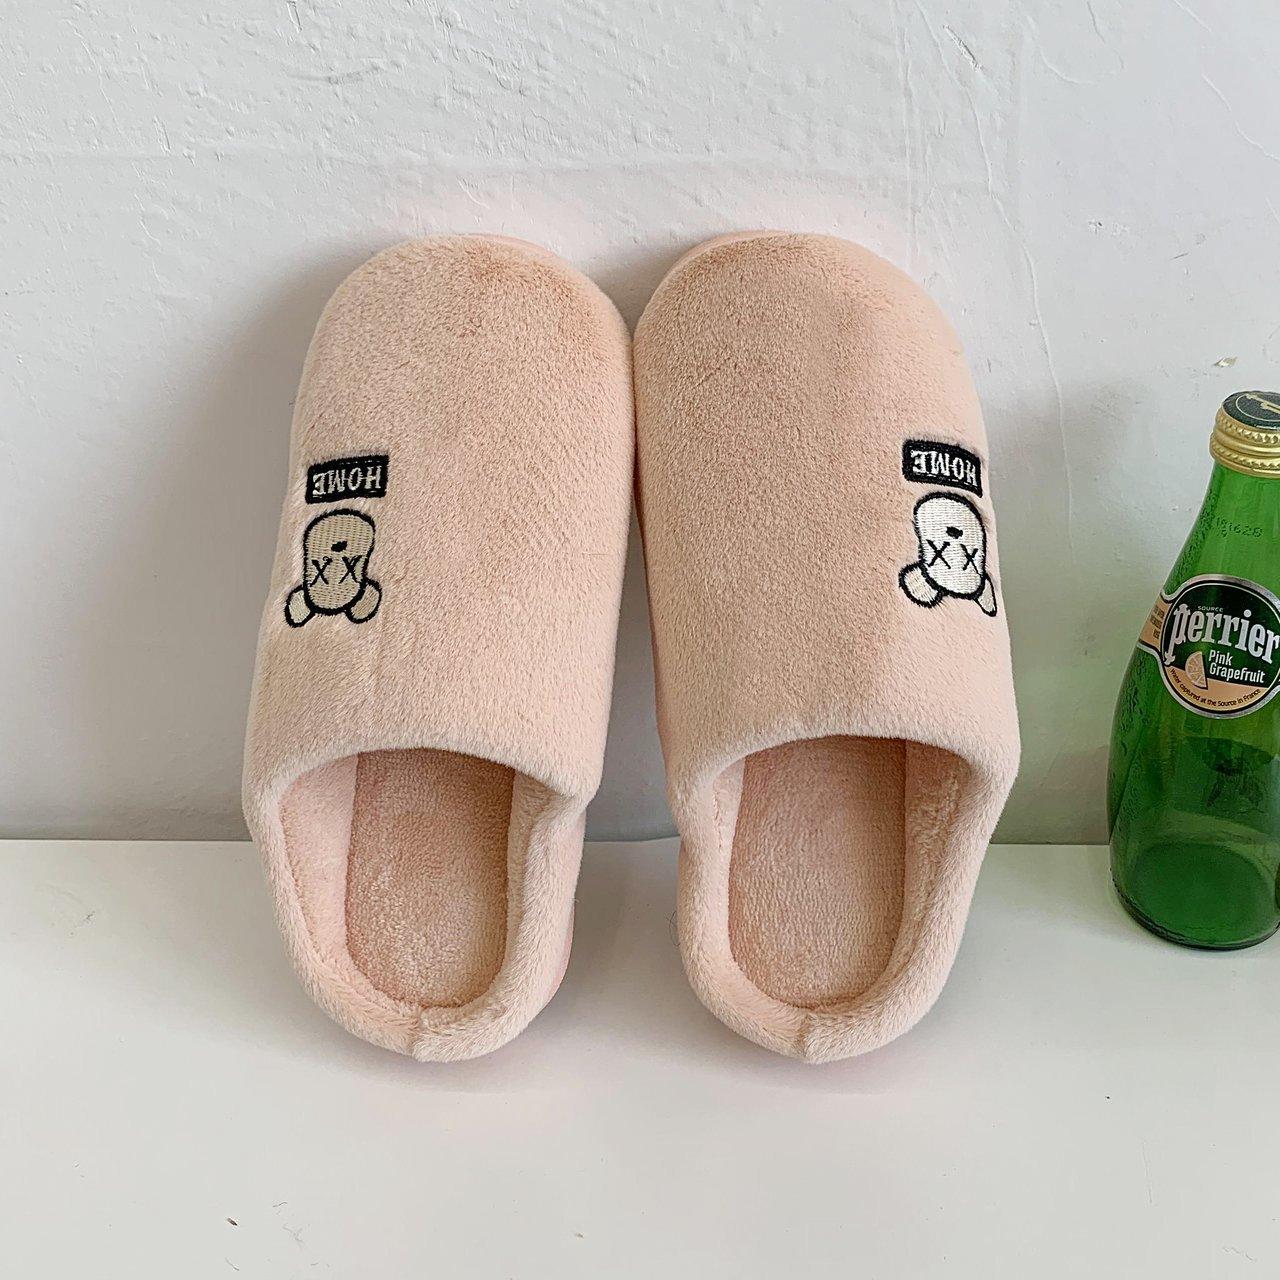 Classic Women Winter Warm Fur Slippers Men Women Boys Girls Slippers House Shoes Flat Heel Home Indo